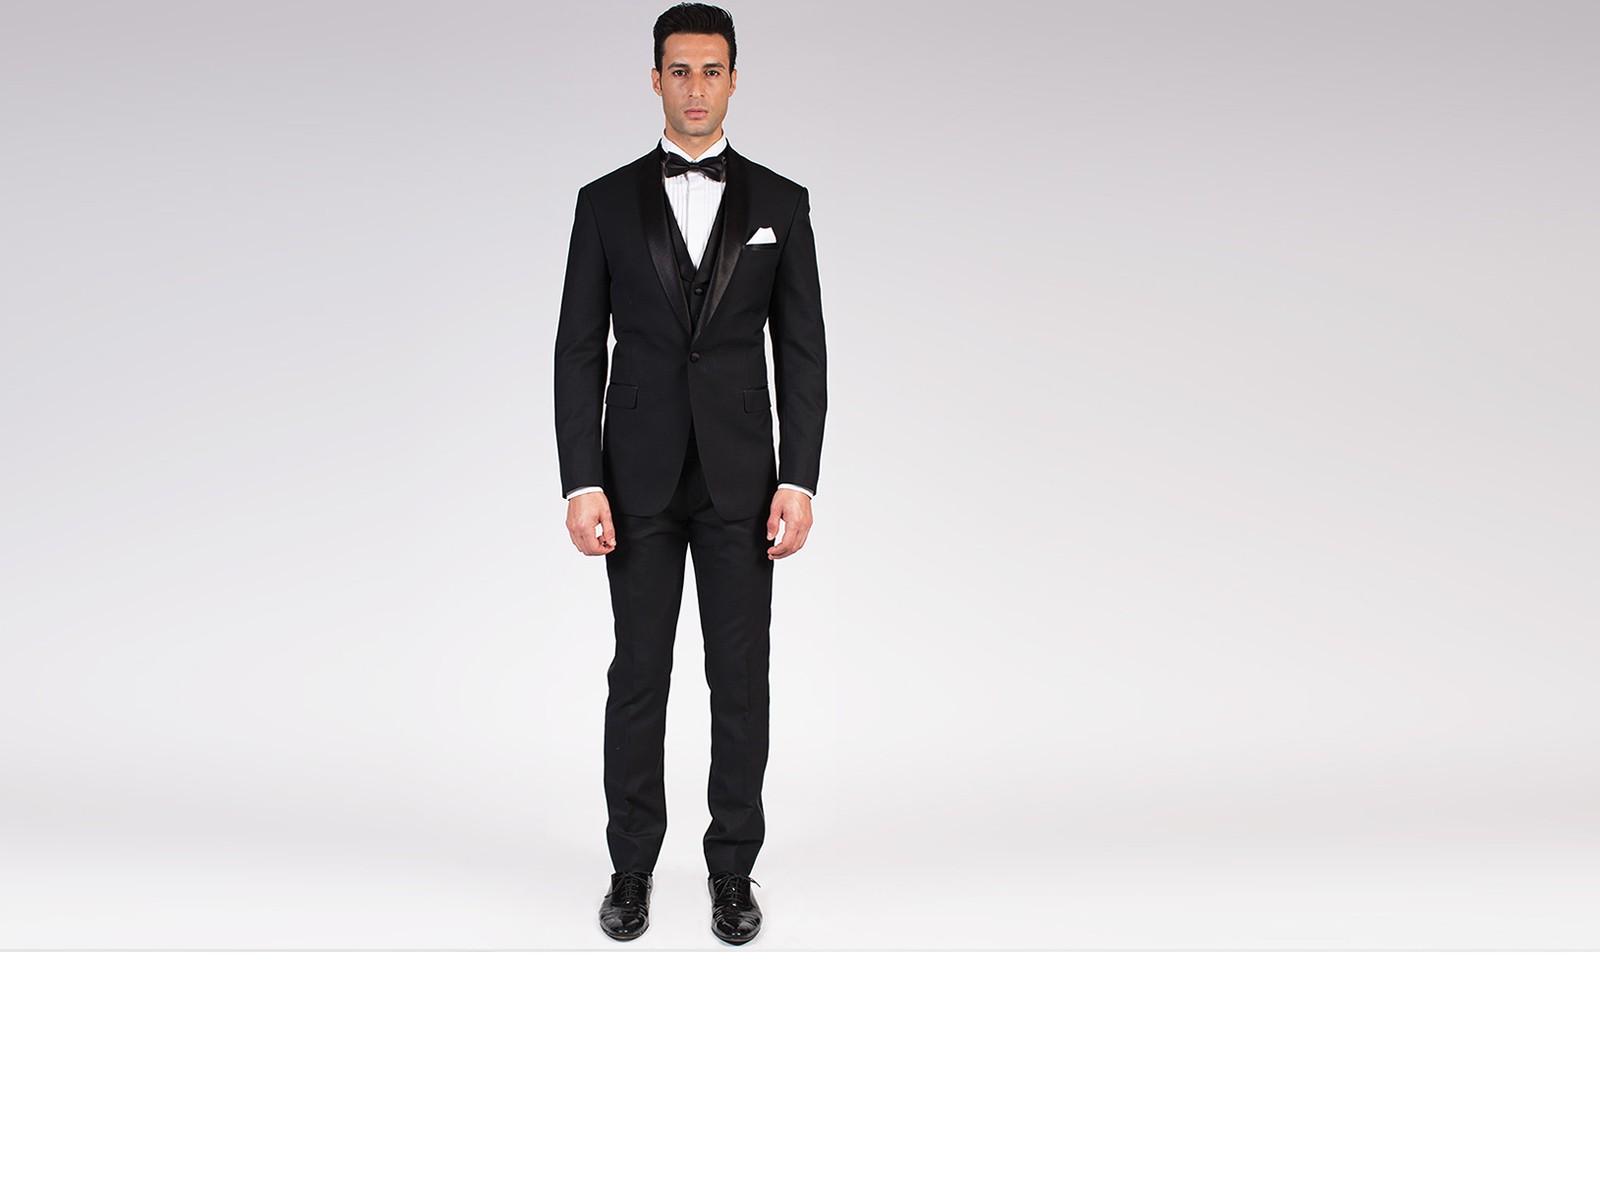 The Dignitary - Black Shawl Collar 3 Piece Custom Tuxedo